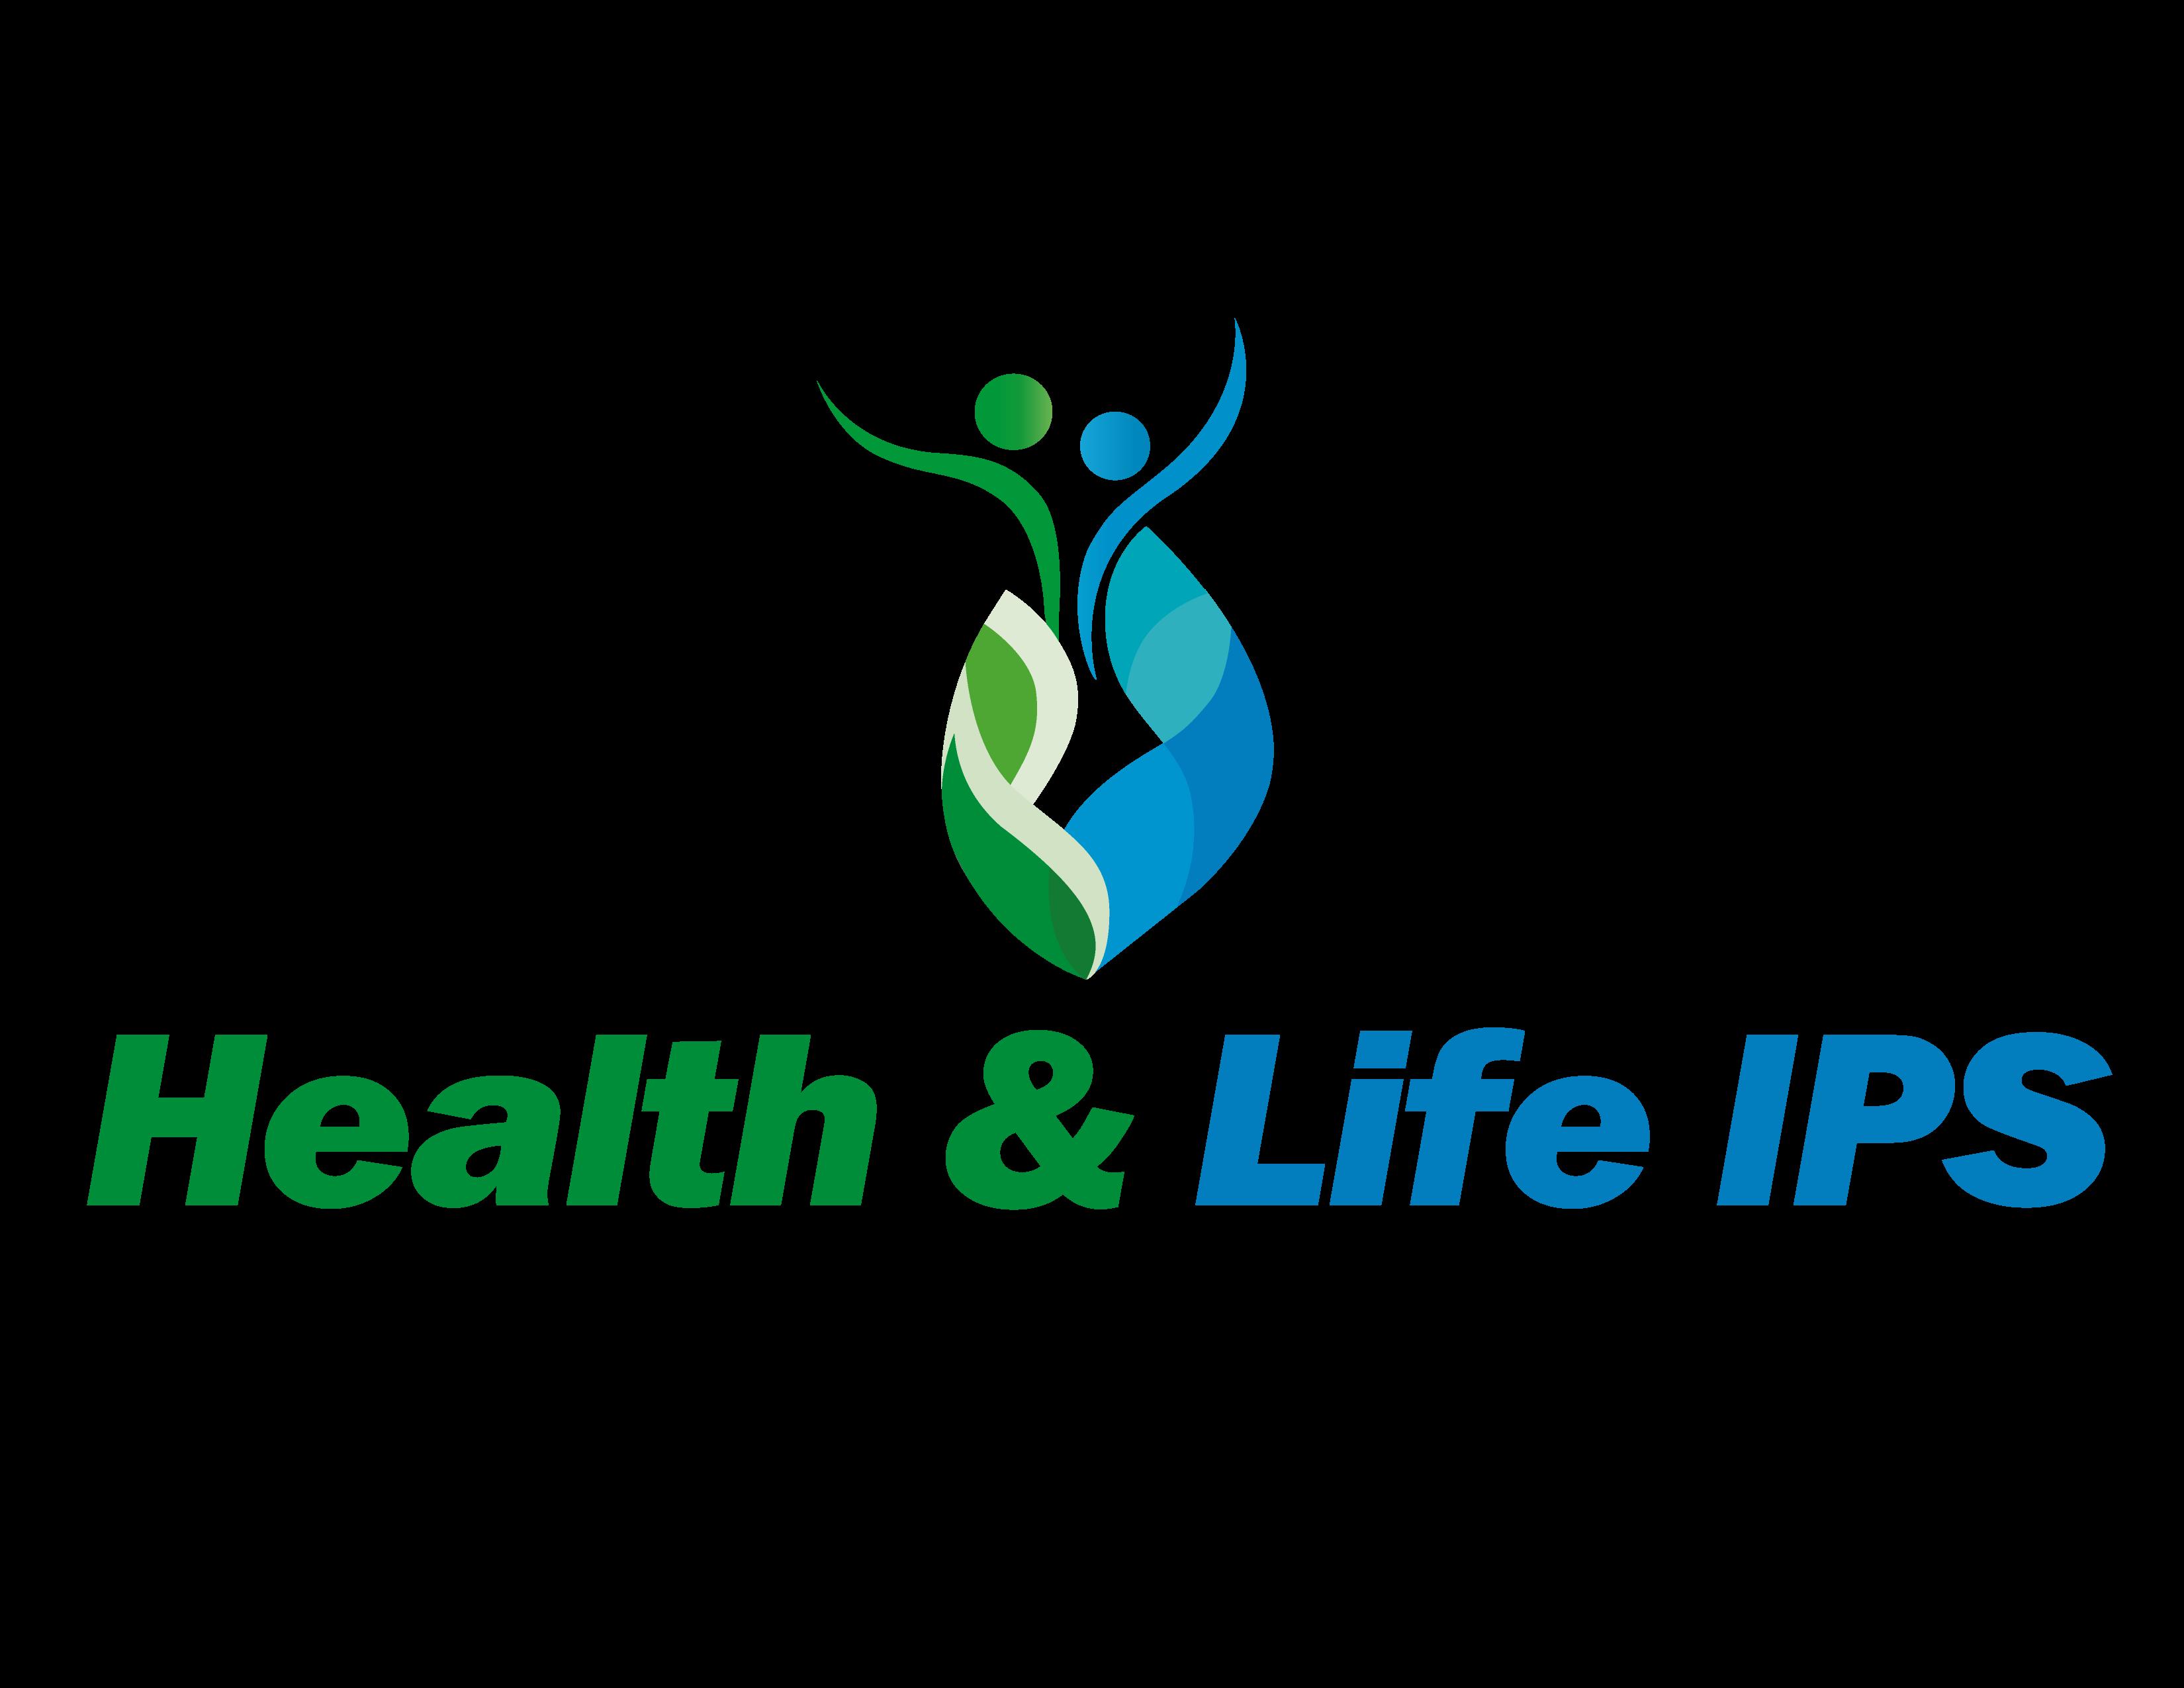 Health and life